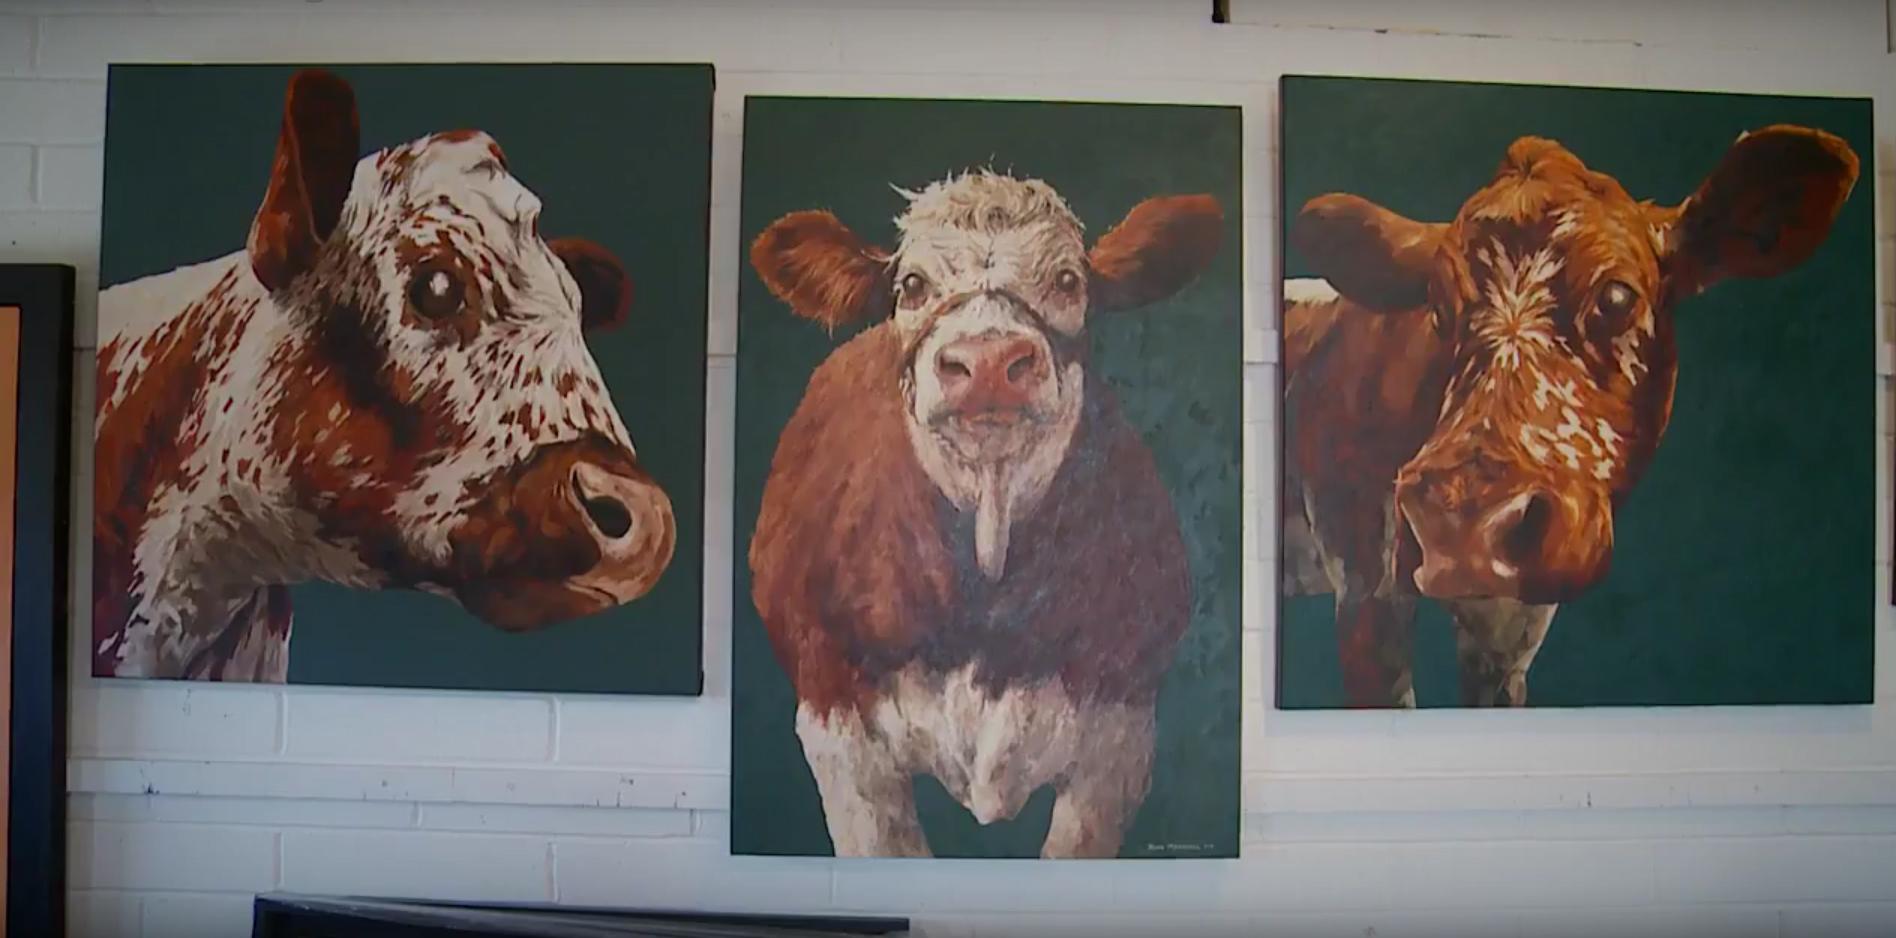 John-Marshall-krave